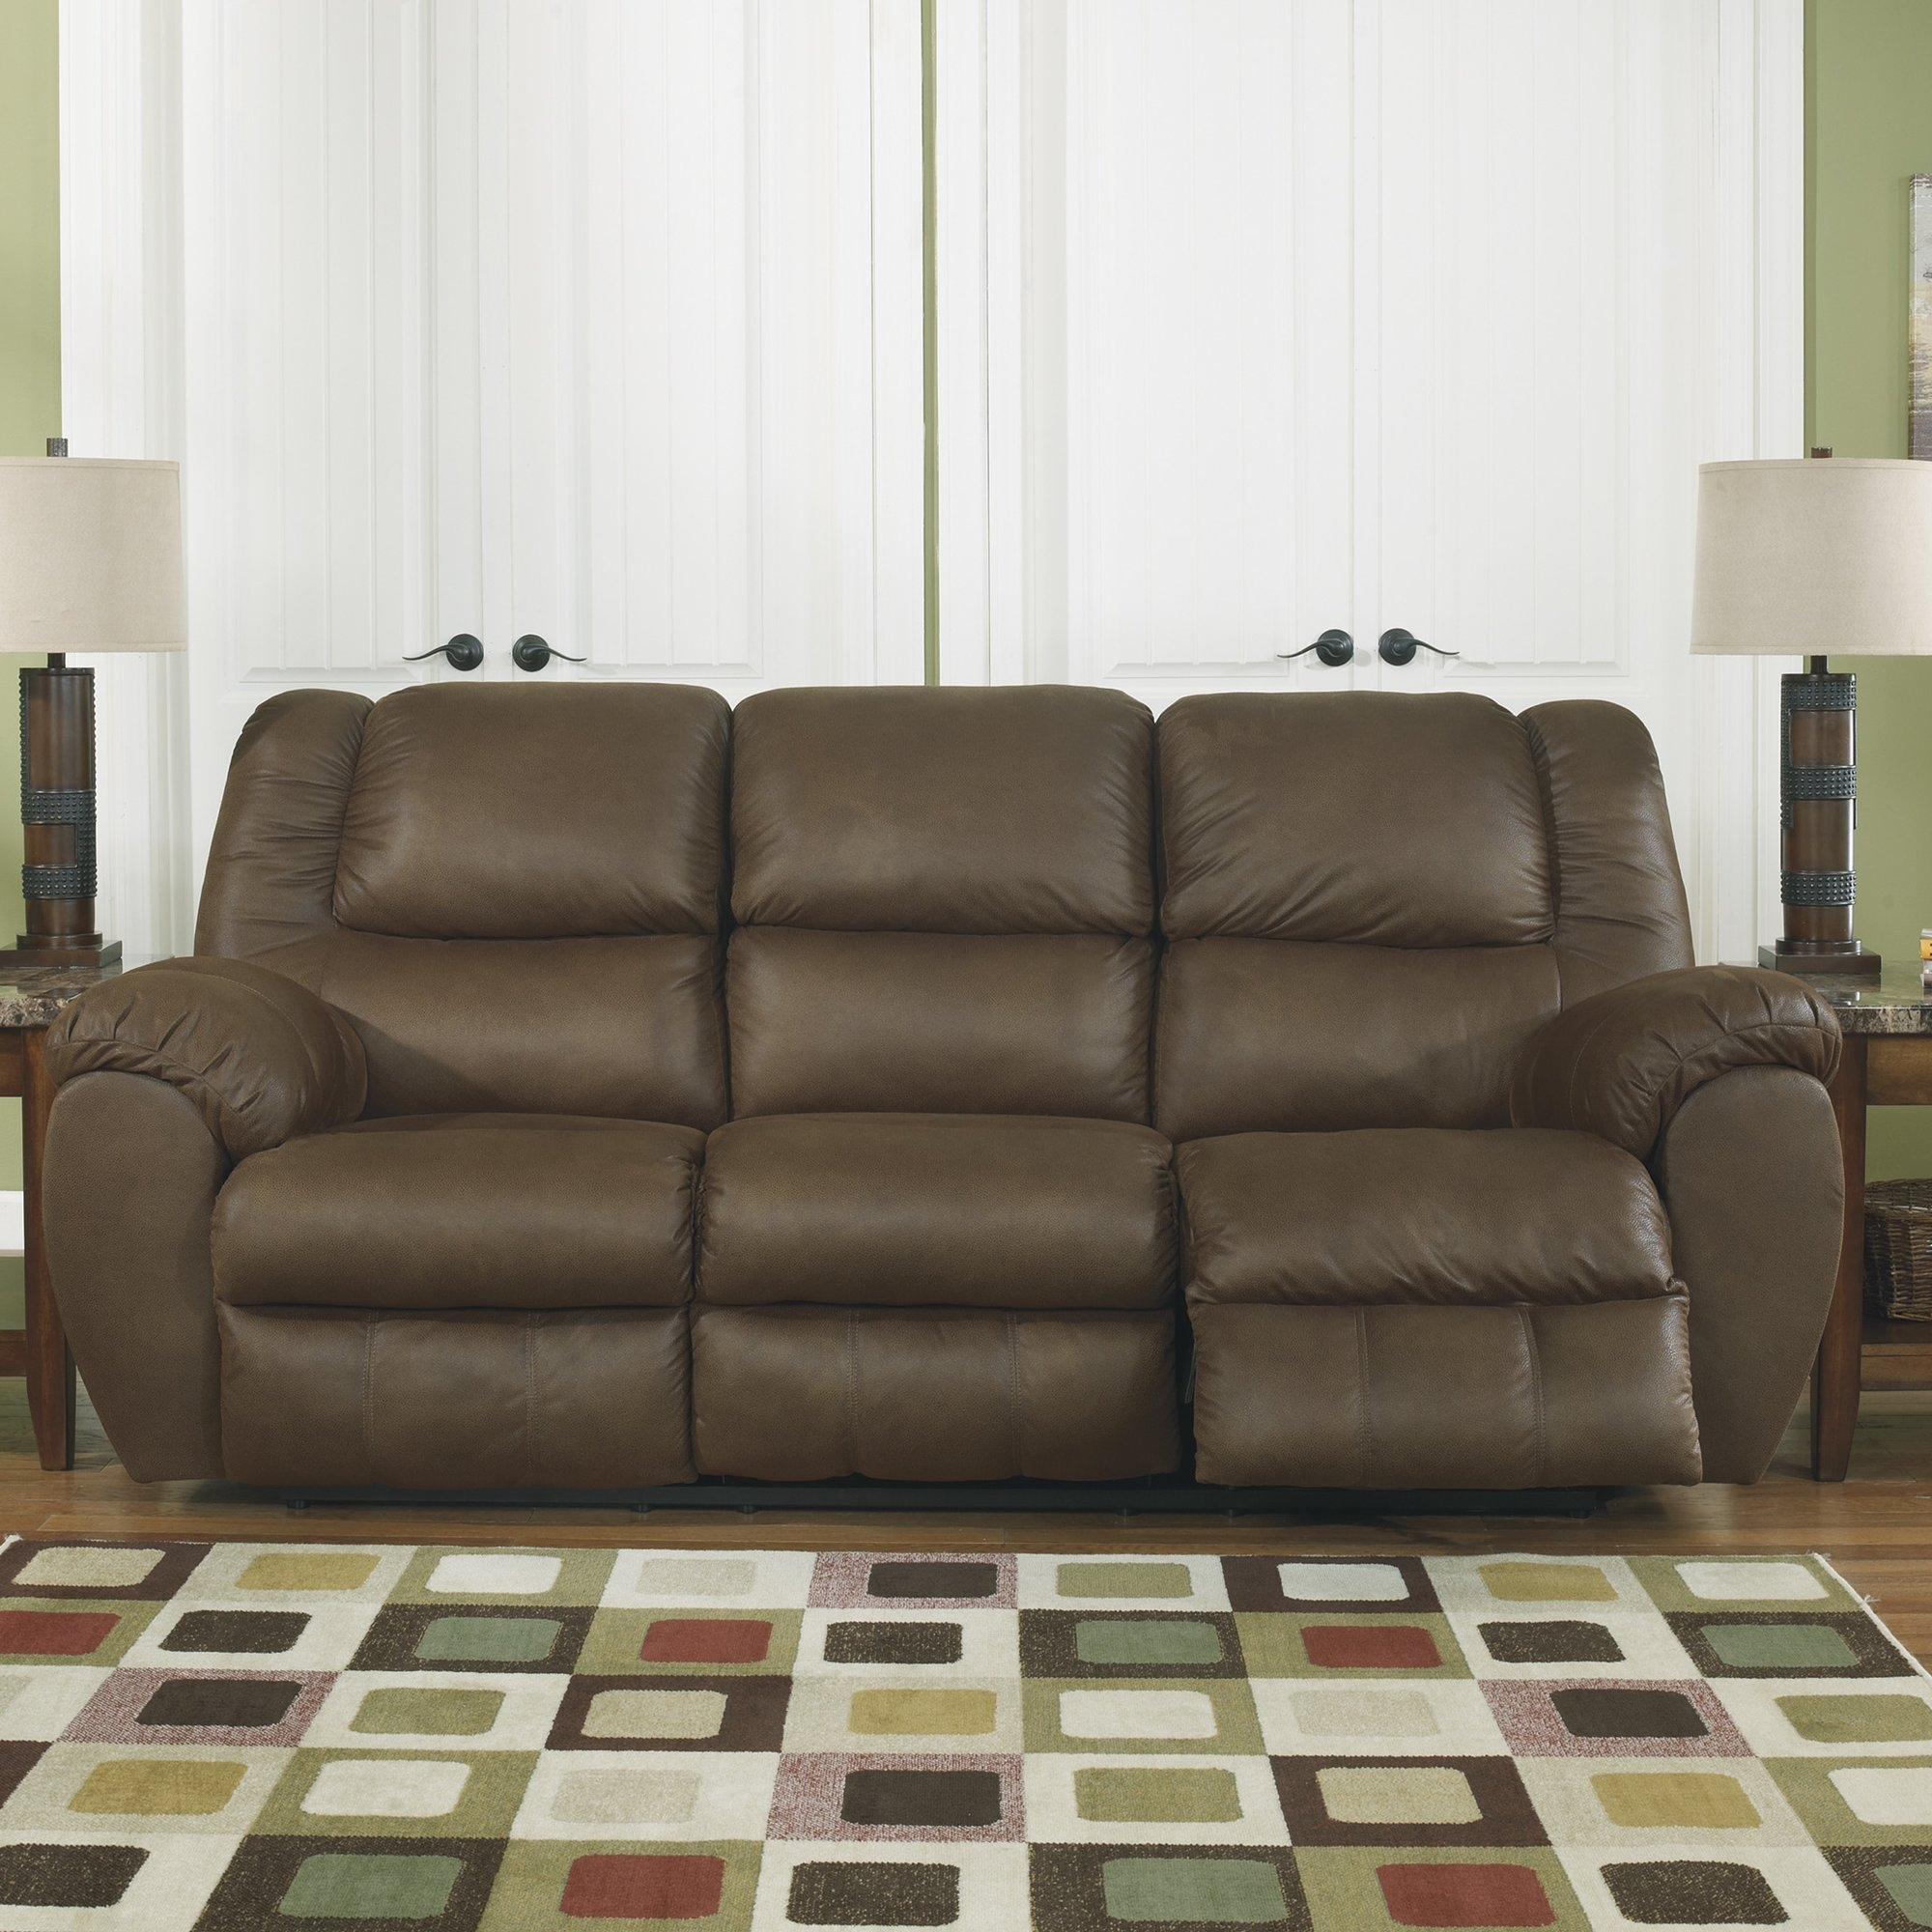 Signature Design Ashley Weatherly Reclining Sofa Reviews Regarding Ashley Tufted Sofa (View 15 of 15)